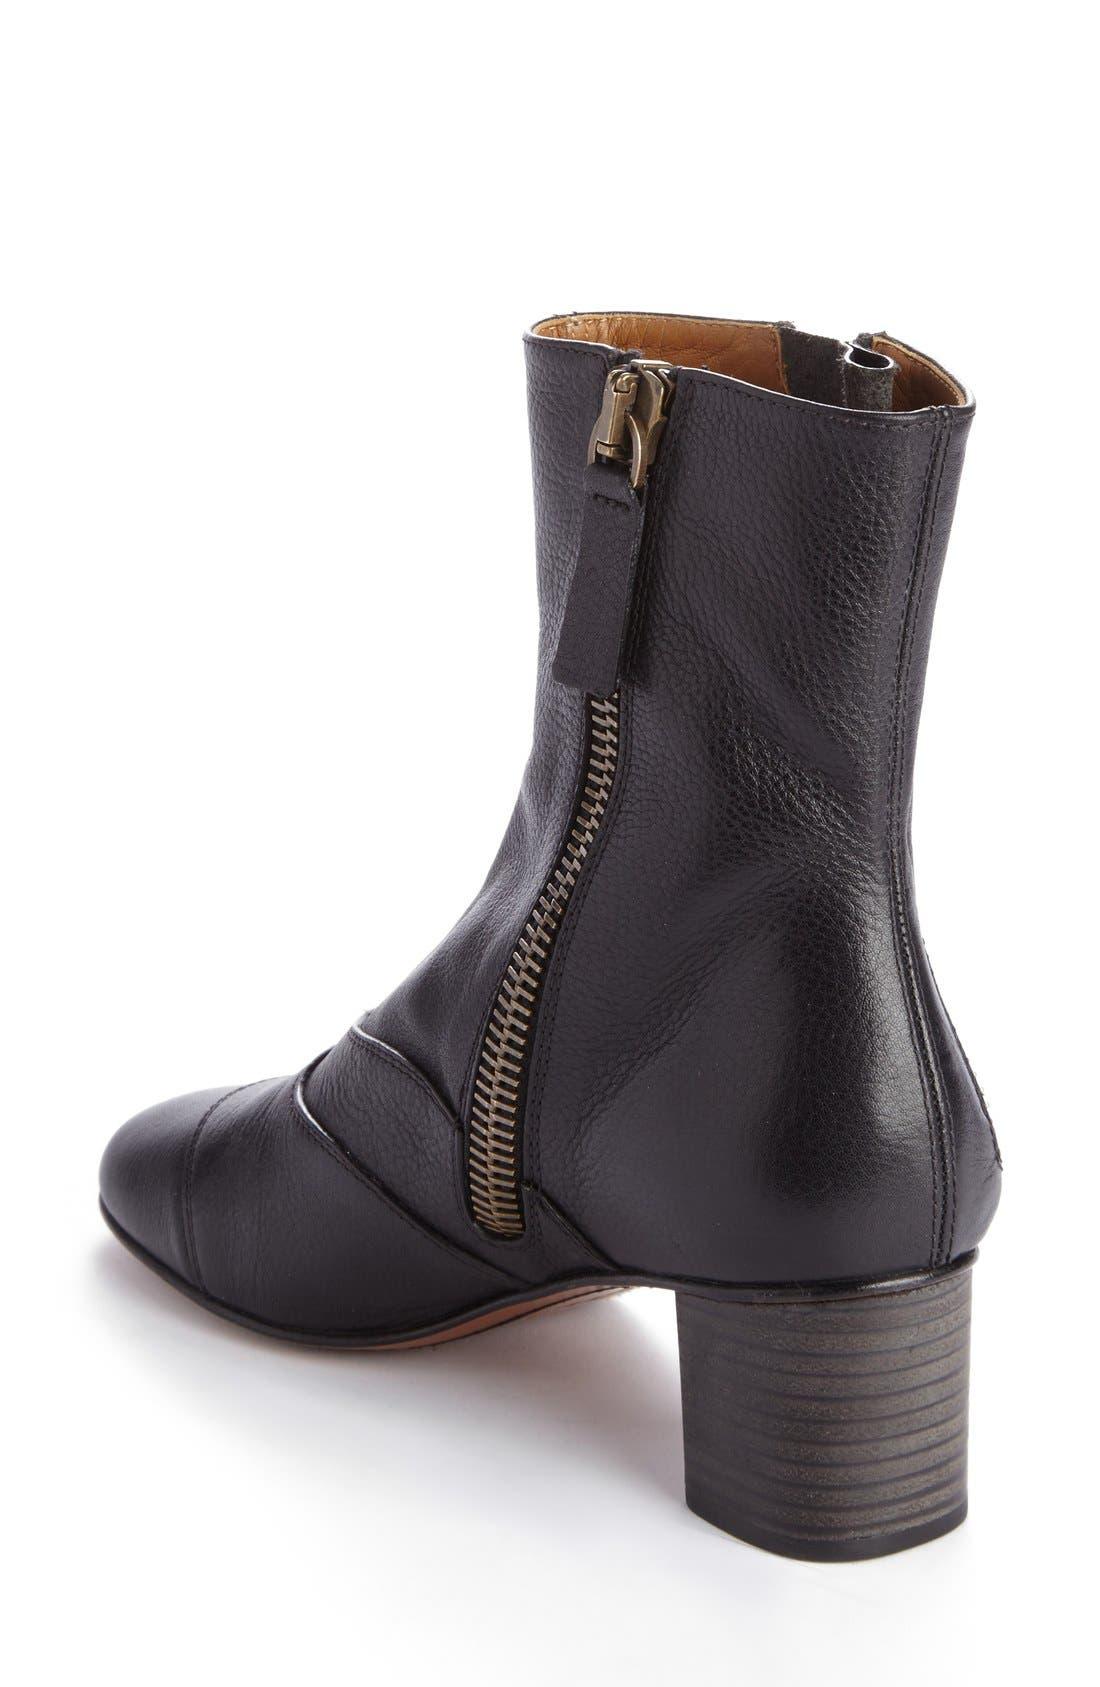 'Lexie' Block Heel Boot,                             Alternate thumbnail 2, color,                             001